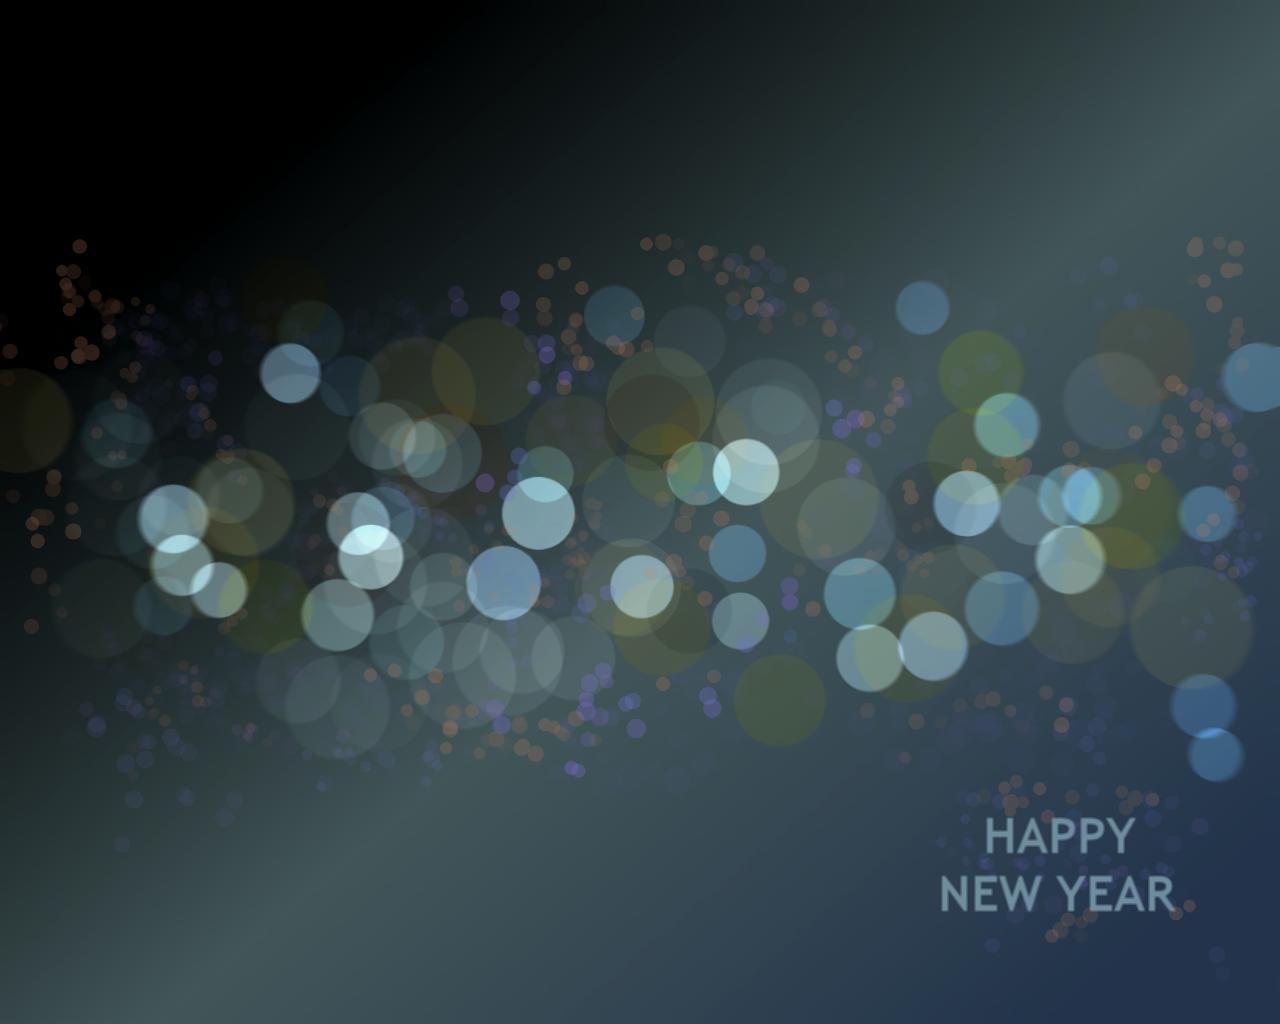 Minimalistic New Year Wallp.